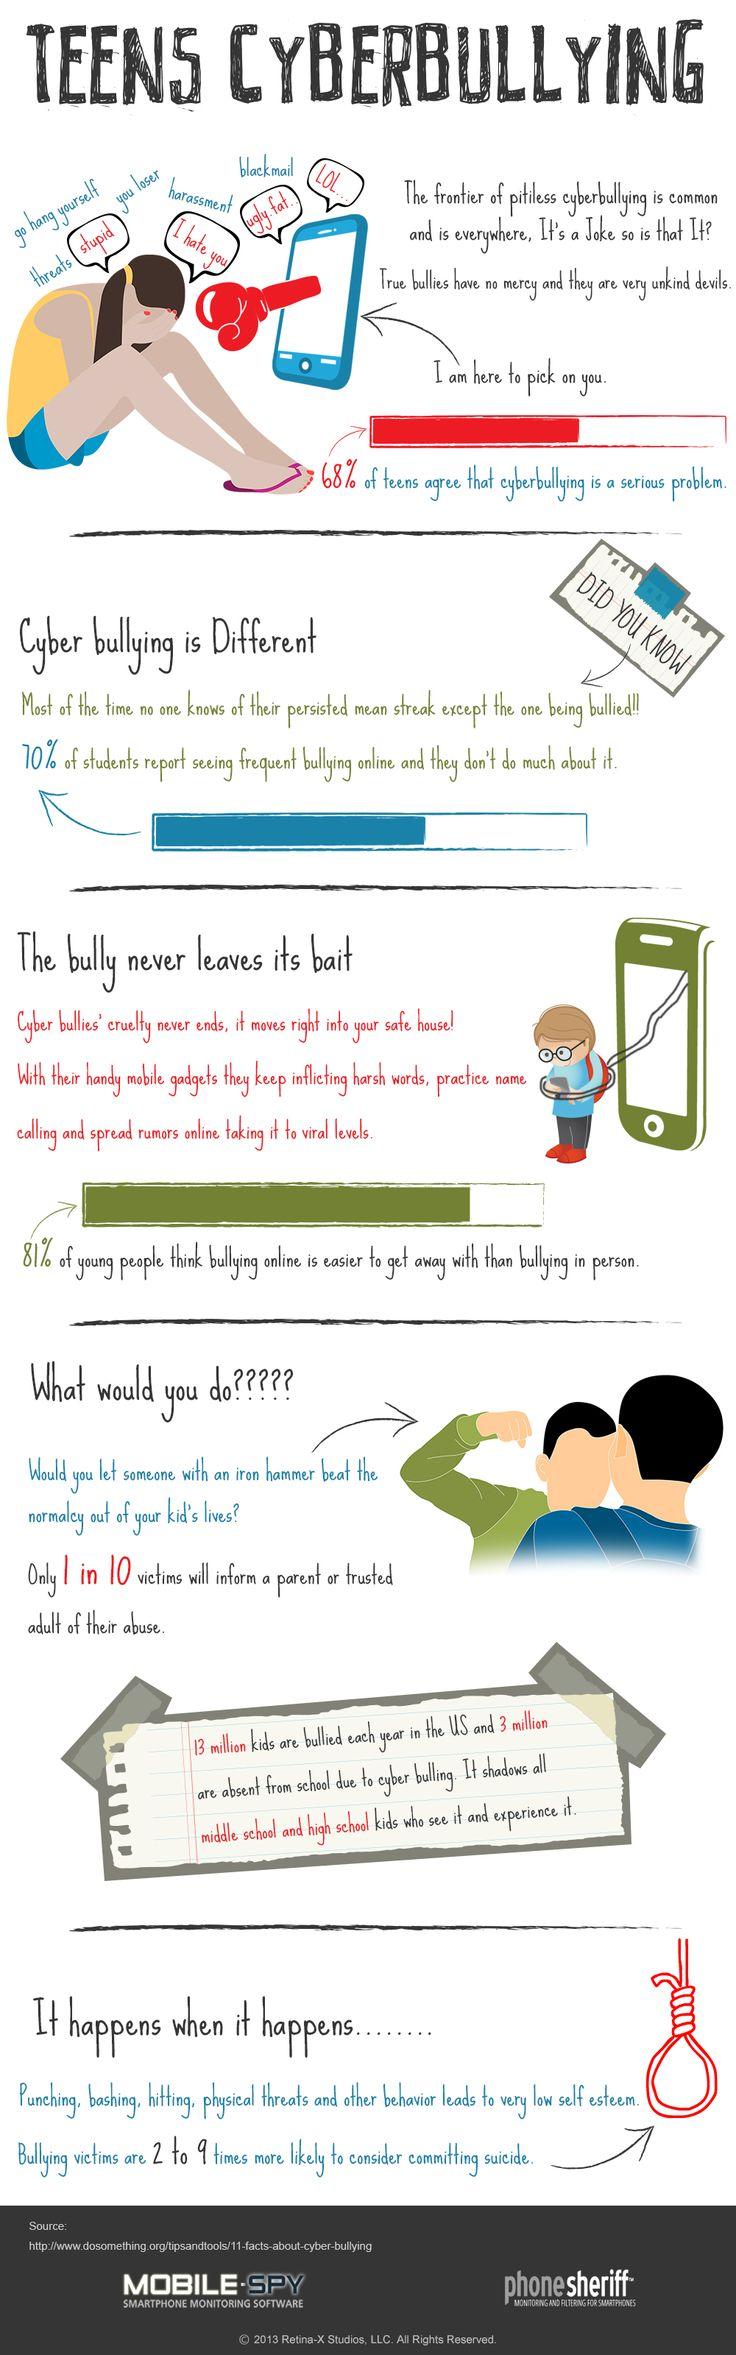 Uncategorized Cyber Bullying Worksheets best 25 teen bullying ideas on pinterest cyber poster ciberbullying y adolescentes infografia infographic internet bullyinganti